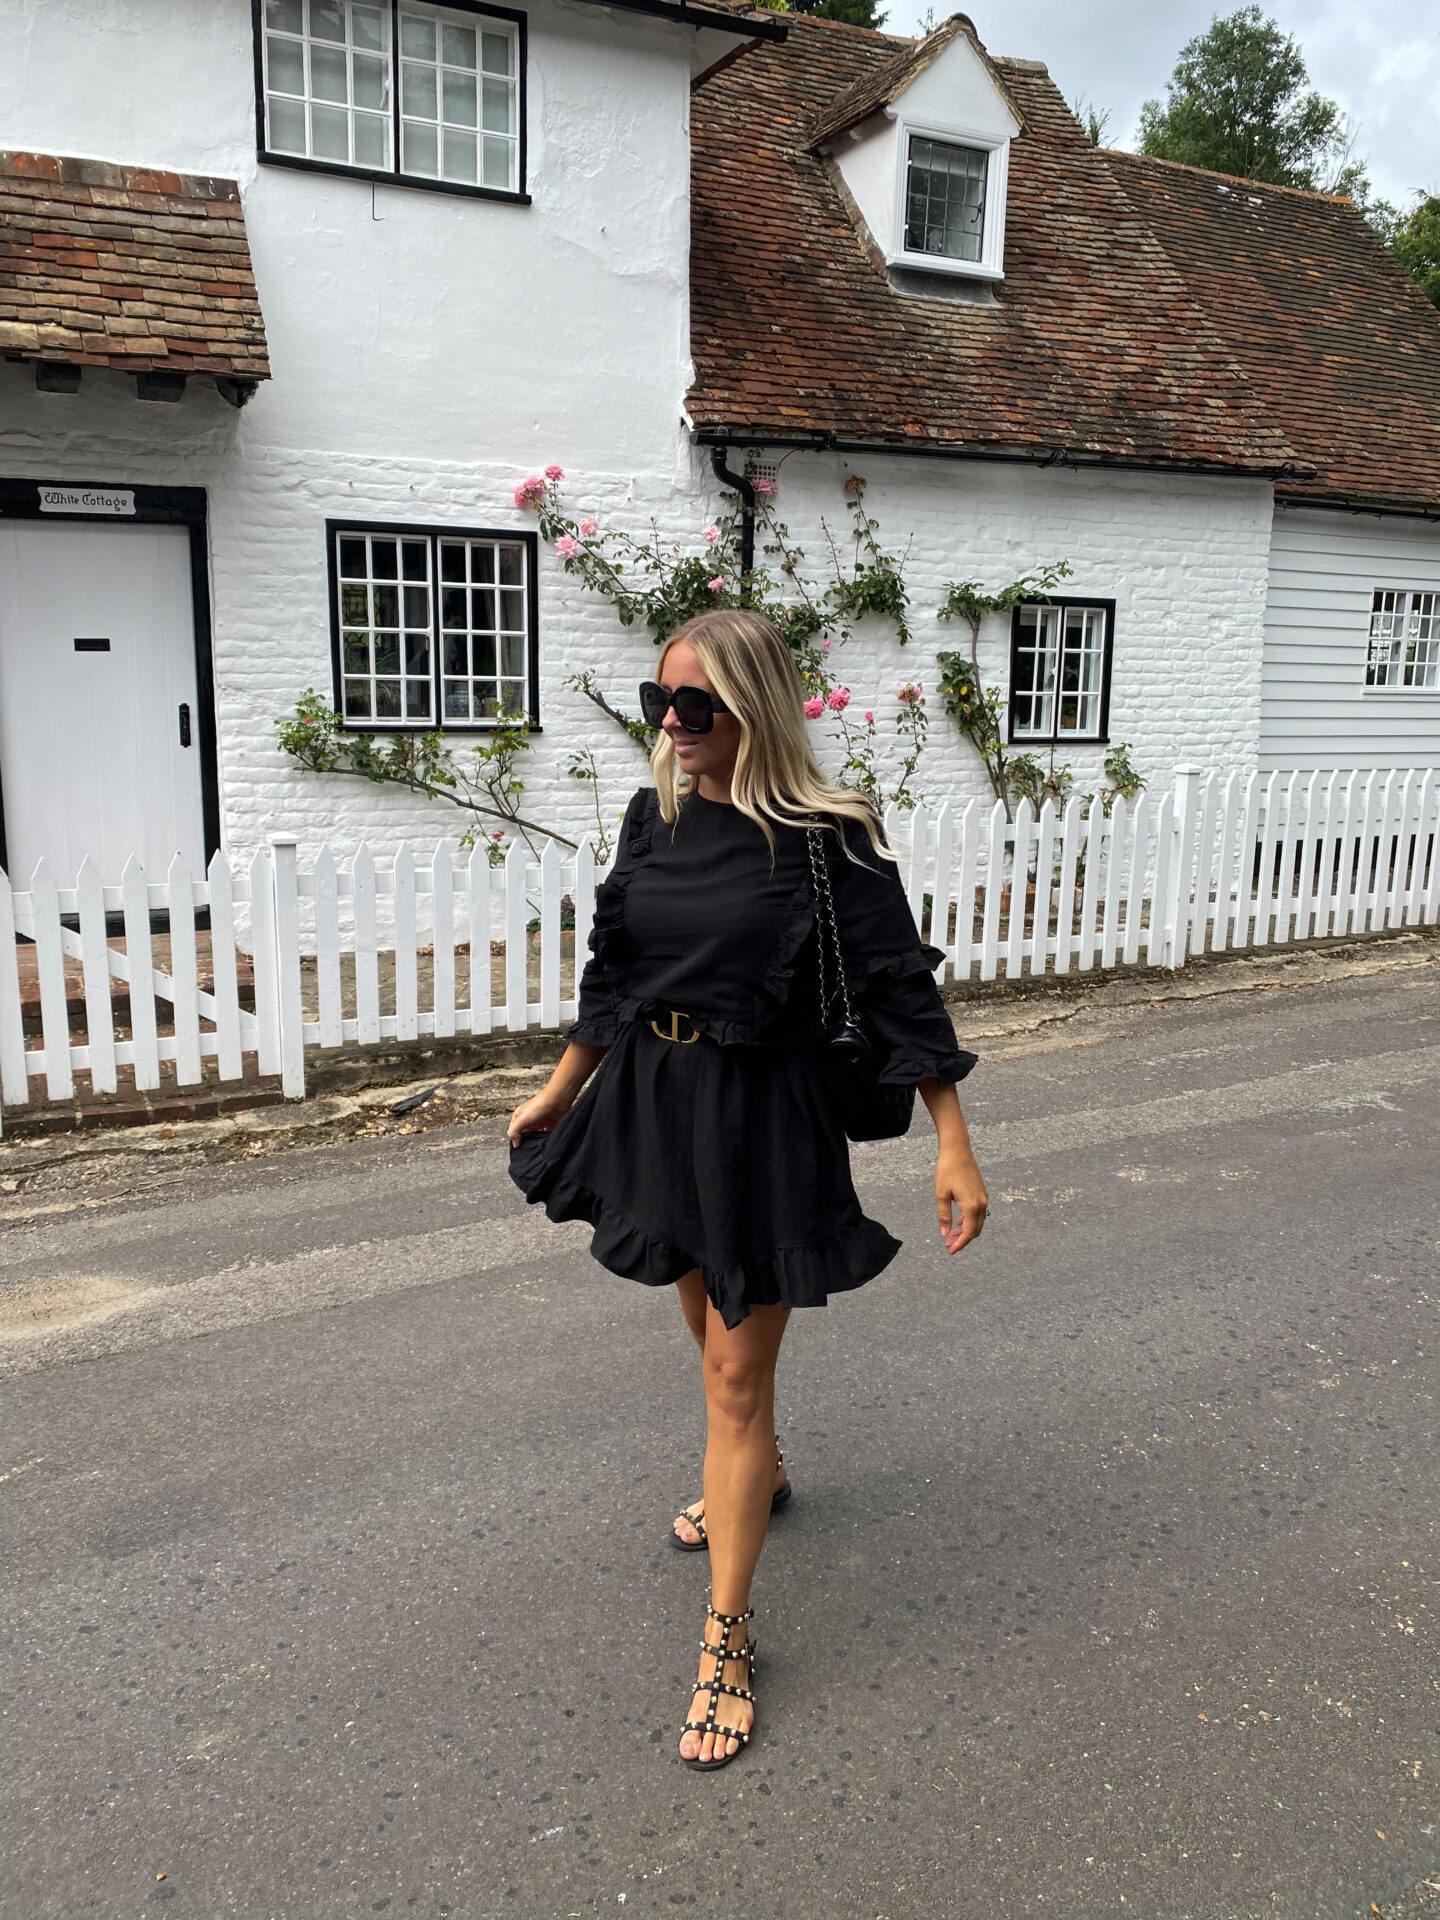 Lorna_Luxe_Girls_Girls_Dress_01